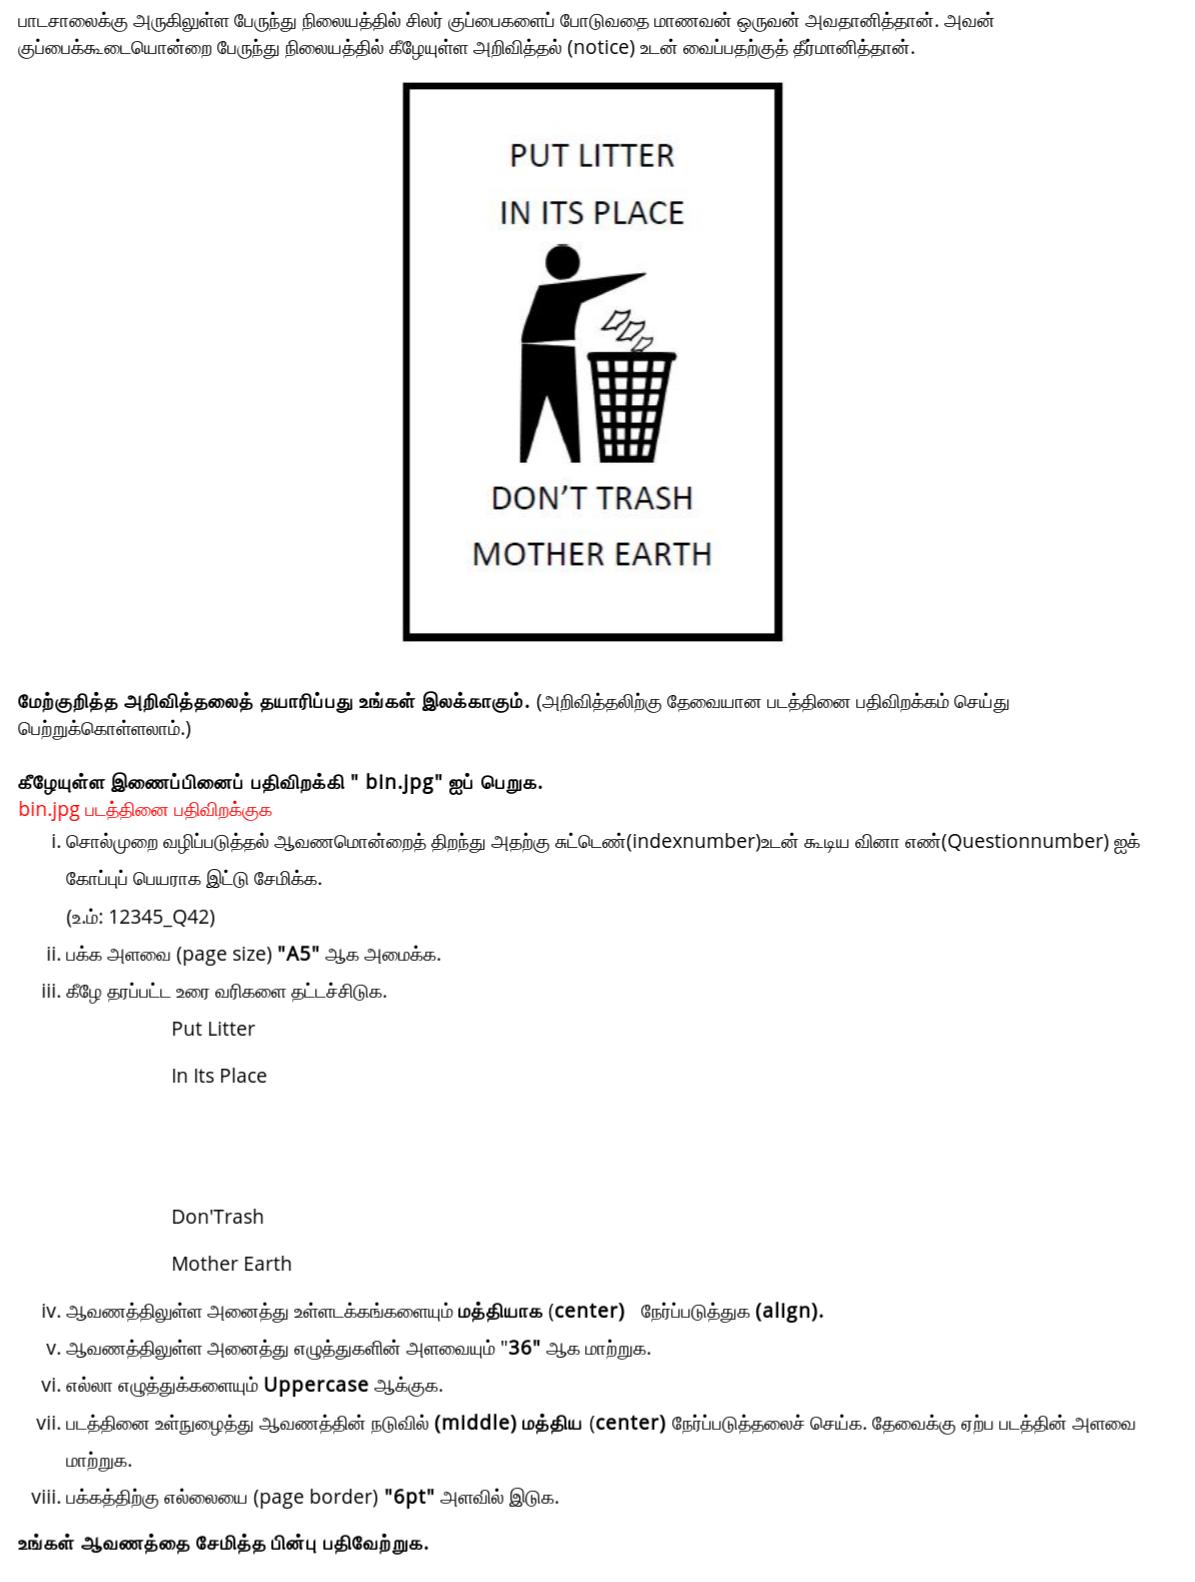 FireShot Capture 002 Model Paper 1 Tamil exam.local  - GIT Online Exam Model Paper 1 Q-No.2 Word Processing